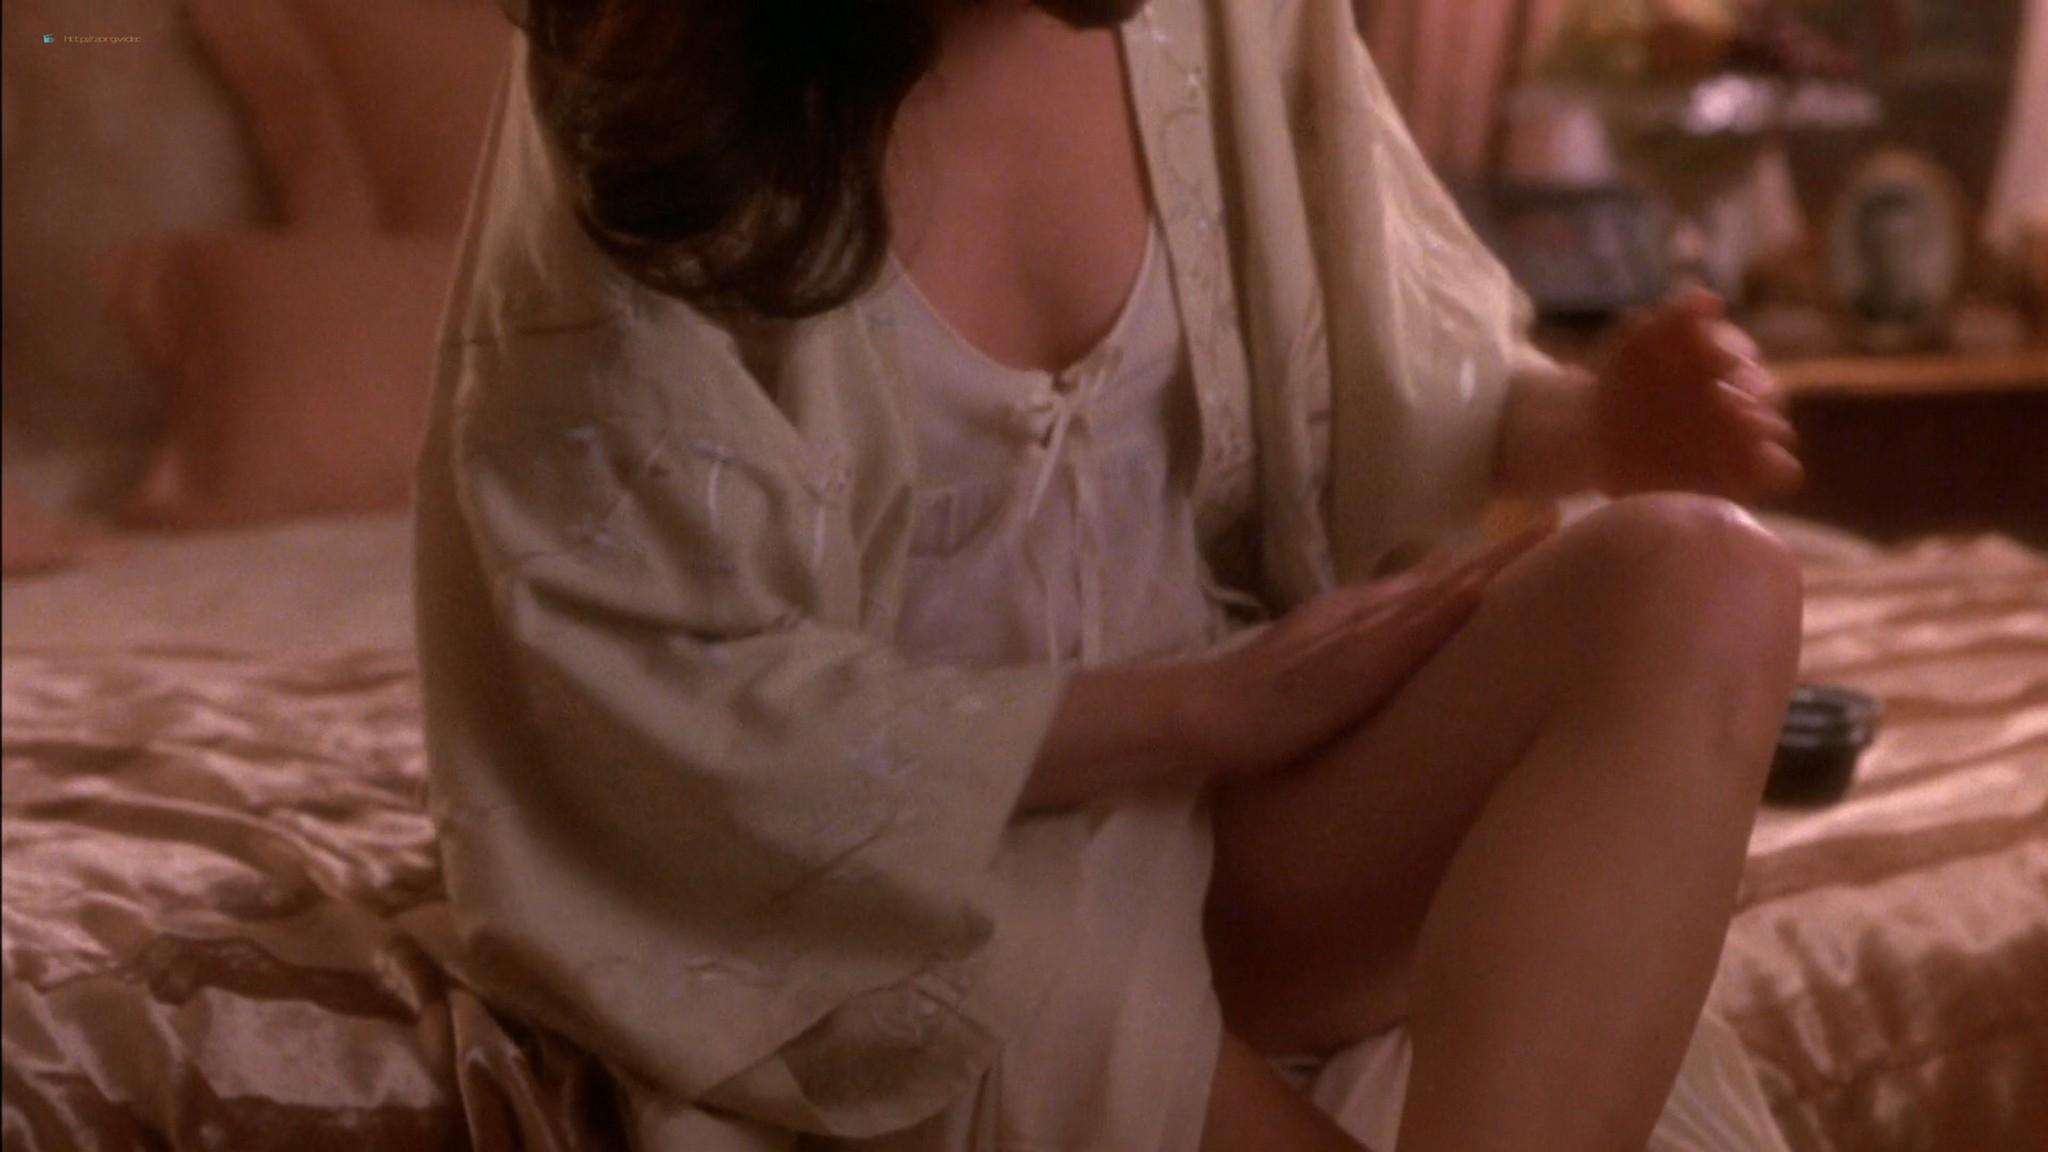 Linda Fiorentino nude Angie Everhart nude full frontal - Jade (1995) HD 1080p BluRay (16)